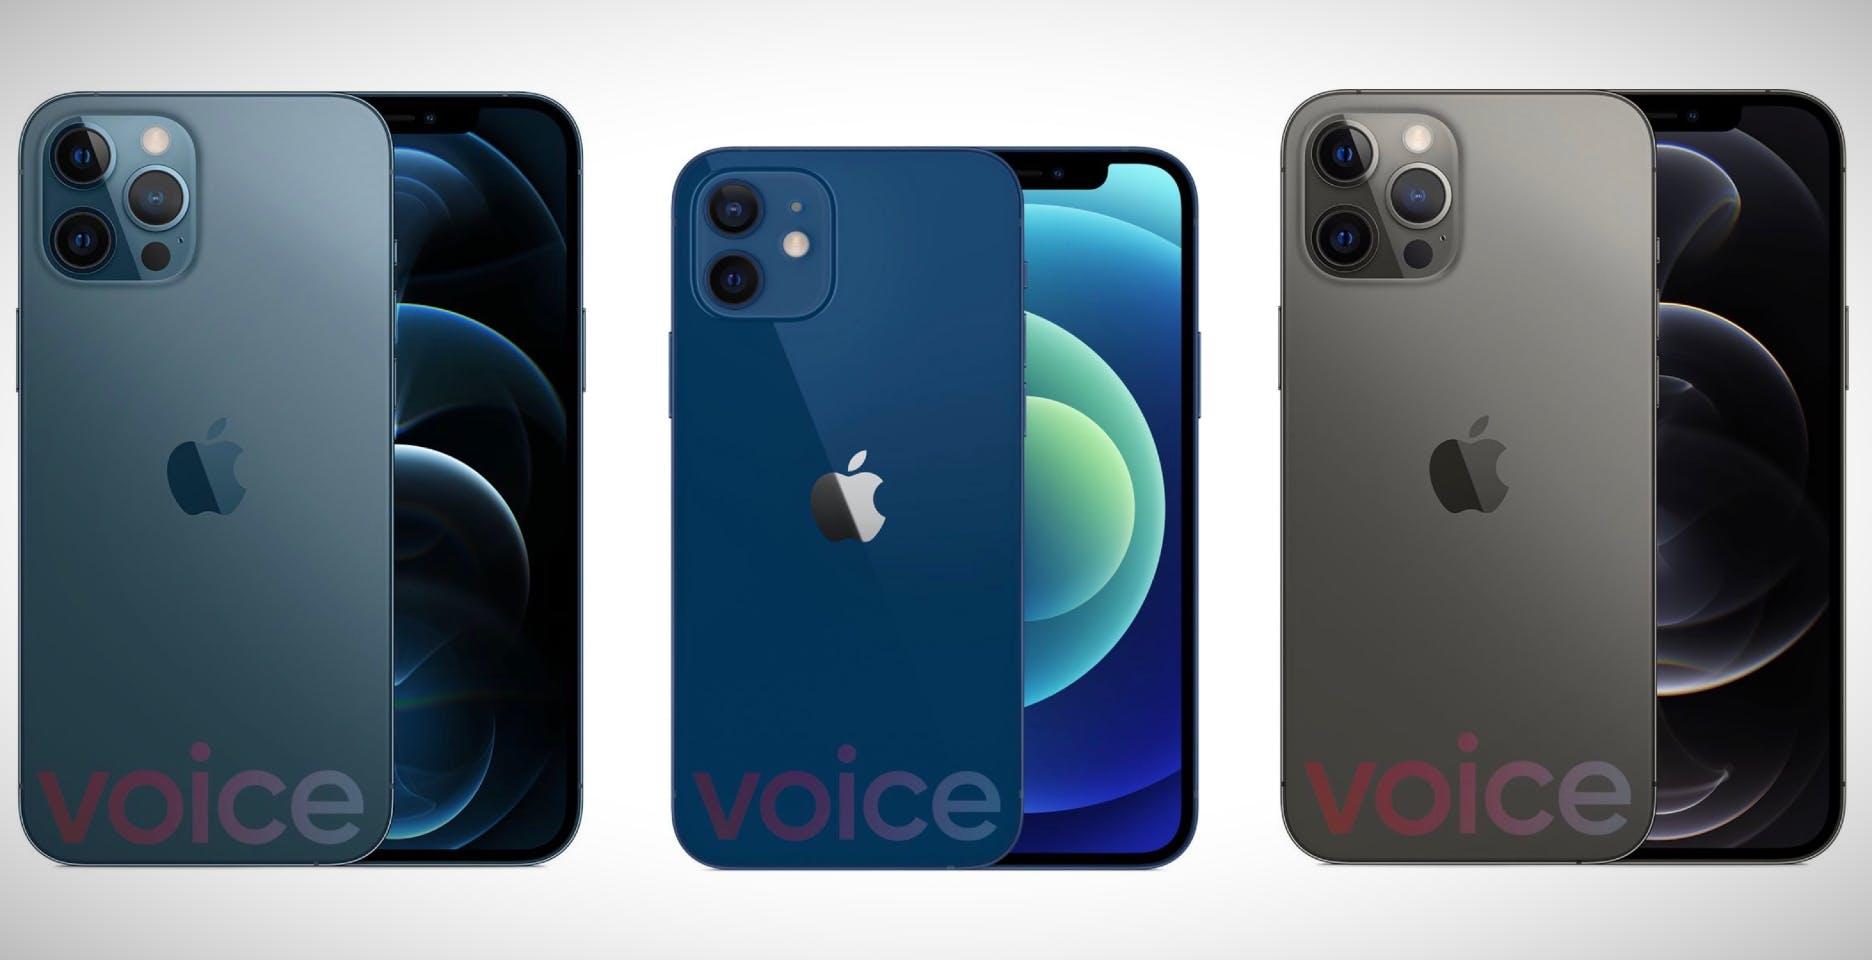 Come saranno i nuovi iPhone 12